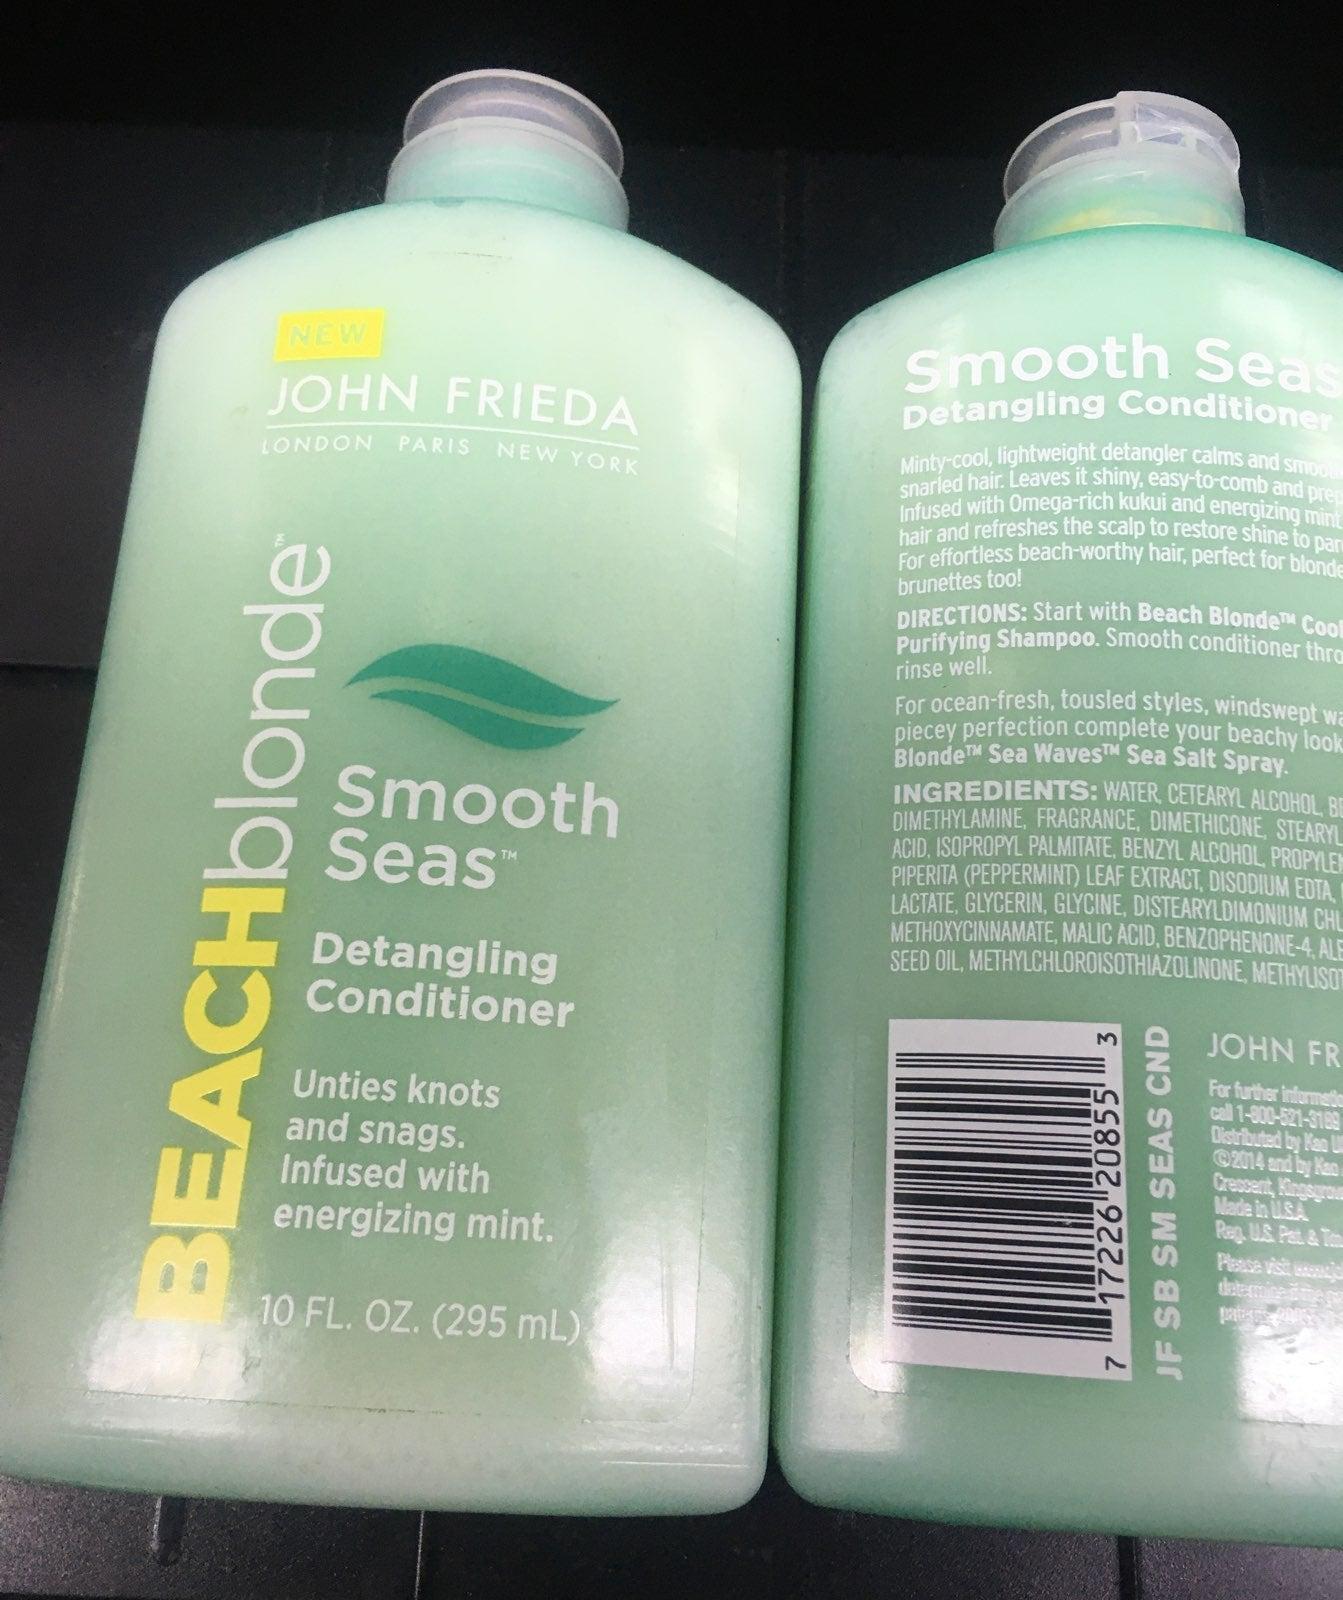 JOHN FRIEDA BEACH Blonde conditioner